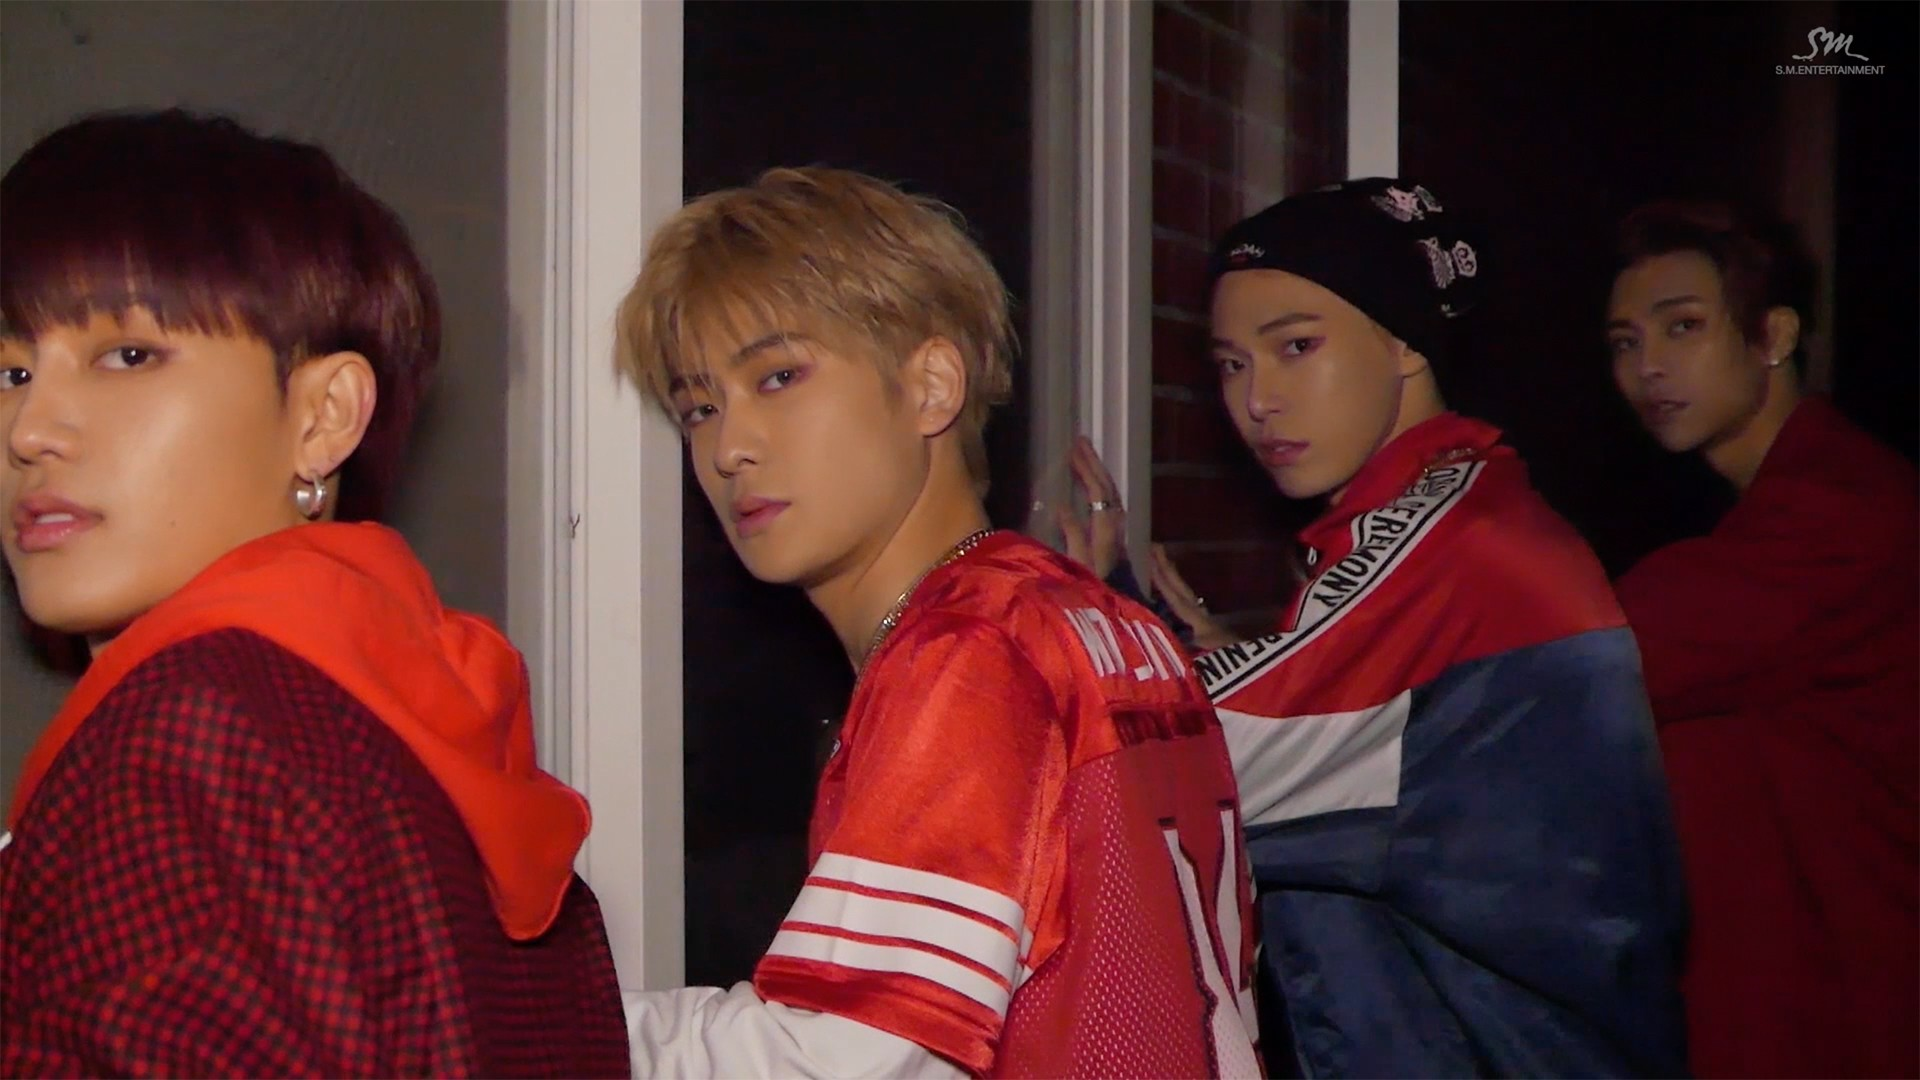 NCT 127_無限的我 (무한적아;Limitless)_Music Video #1 Rough Ver.